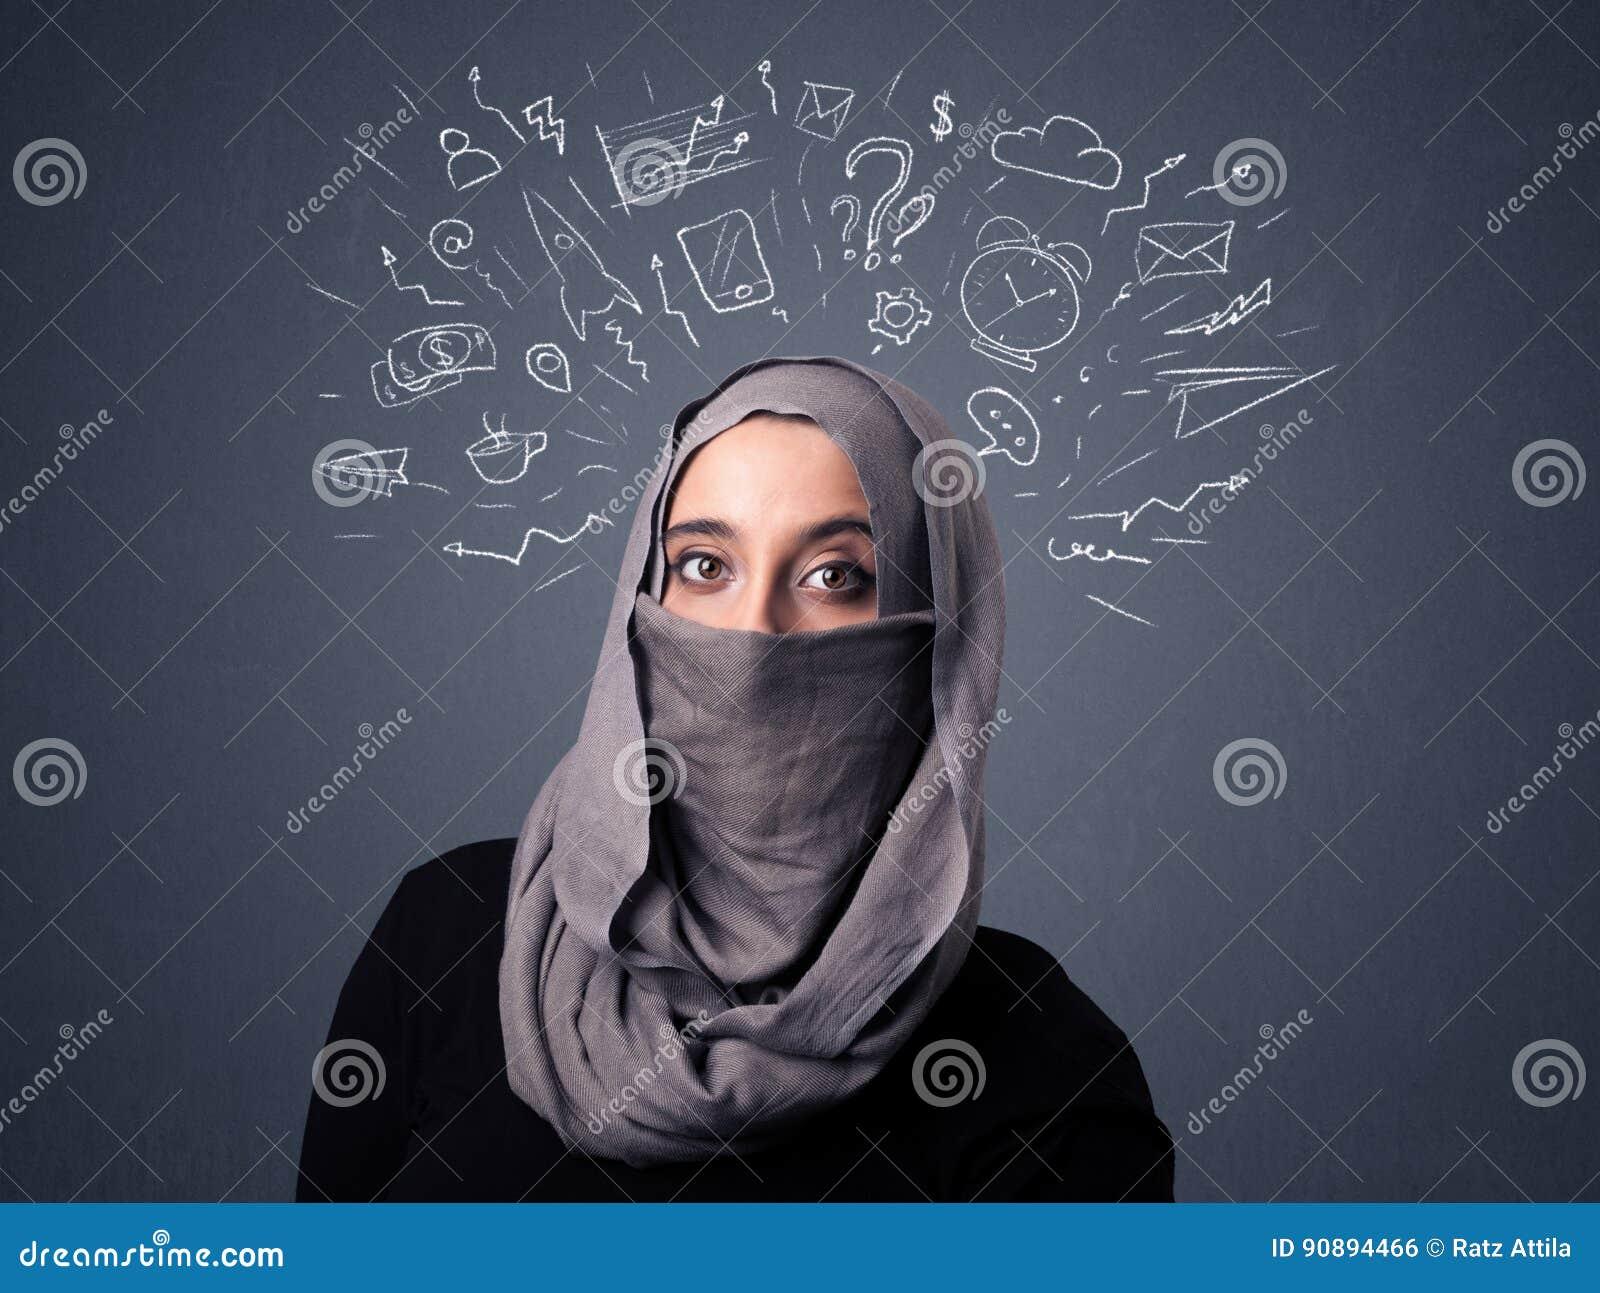 date single muslim girls in manitoba Muslim dating for winnipeg muslim singles single muslim men and women in the winnipeg area one of the largest online dating apps for manitoba muslim singles.